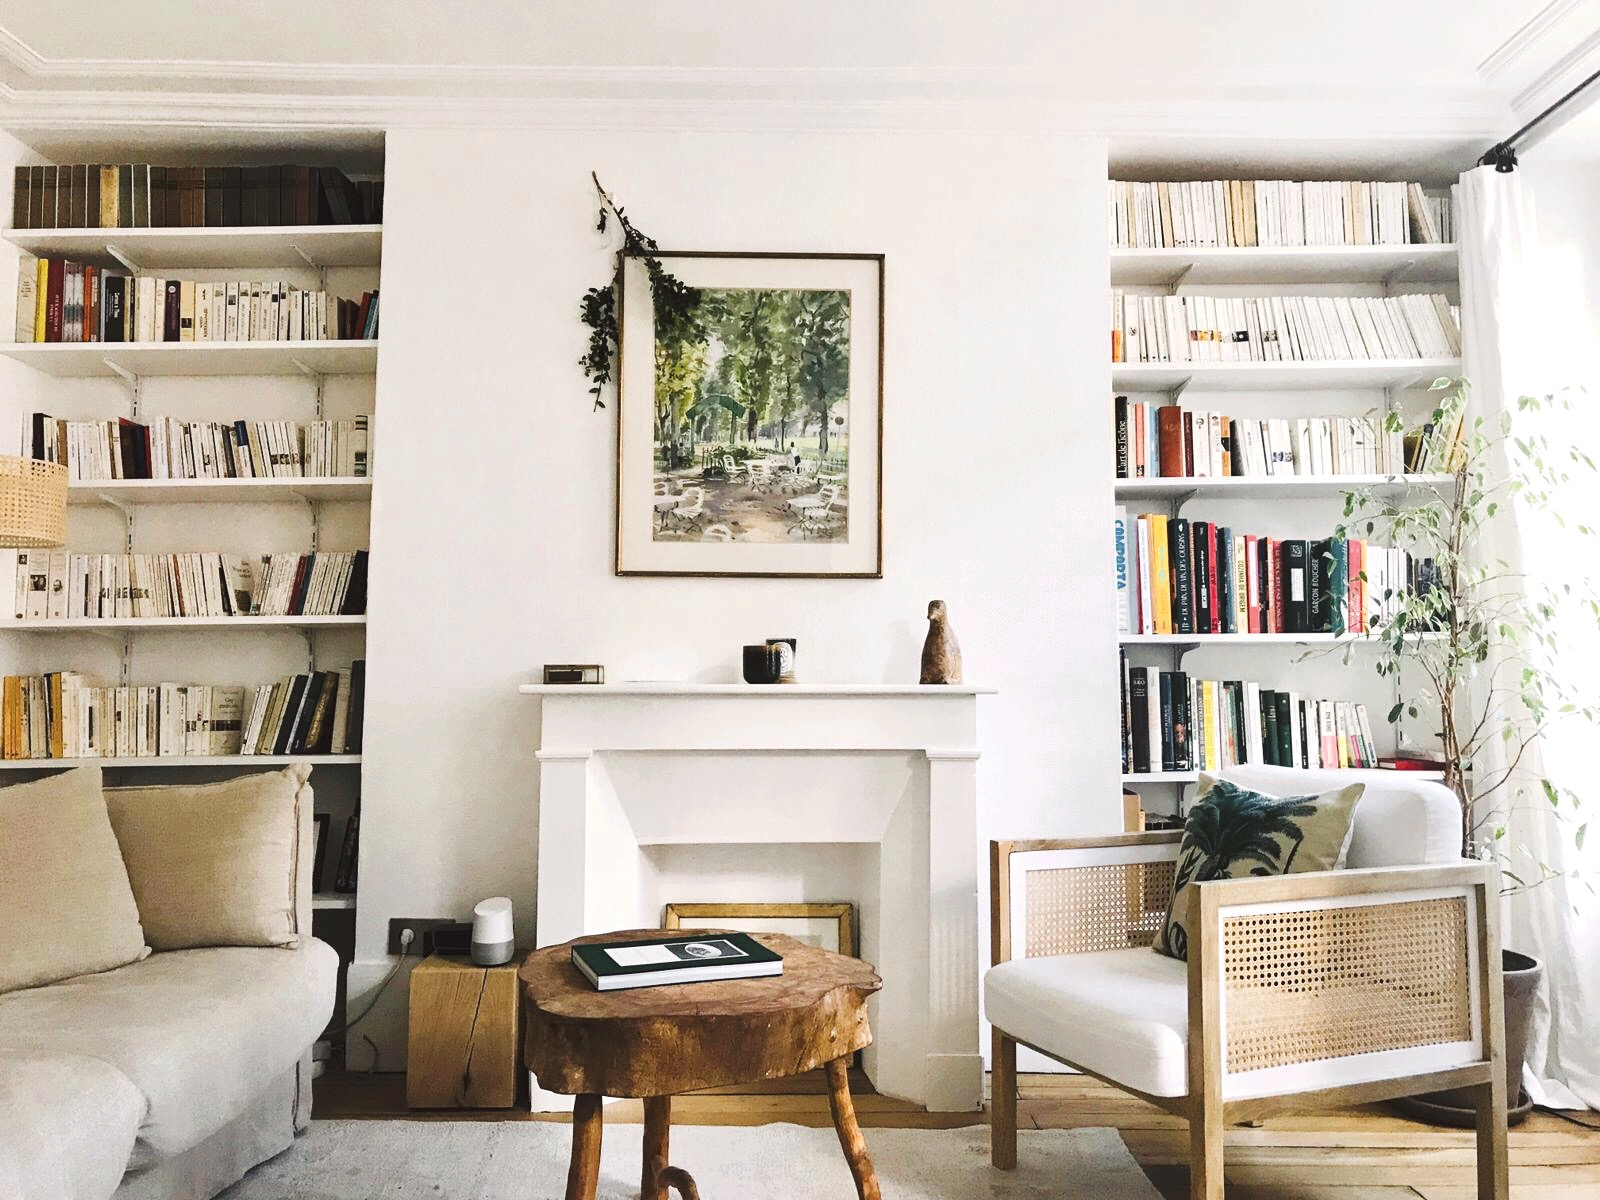 apartment paris lolla - Um Apartamento Charmoso em Paris